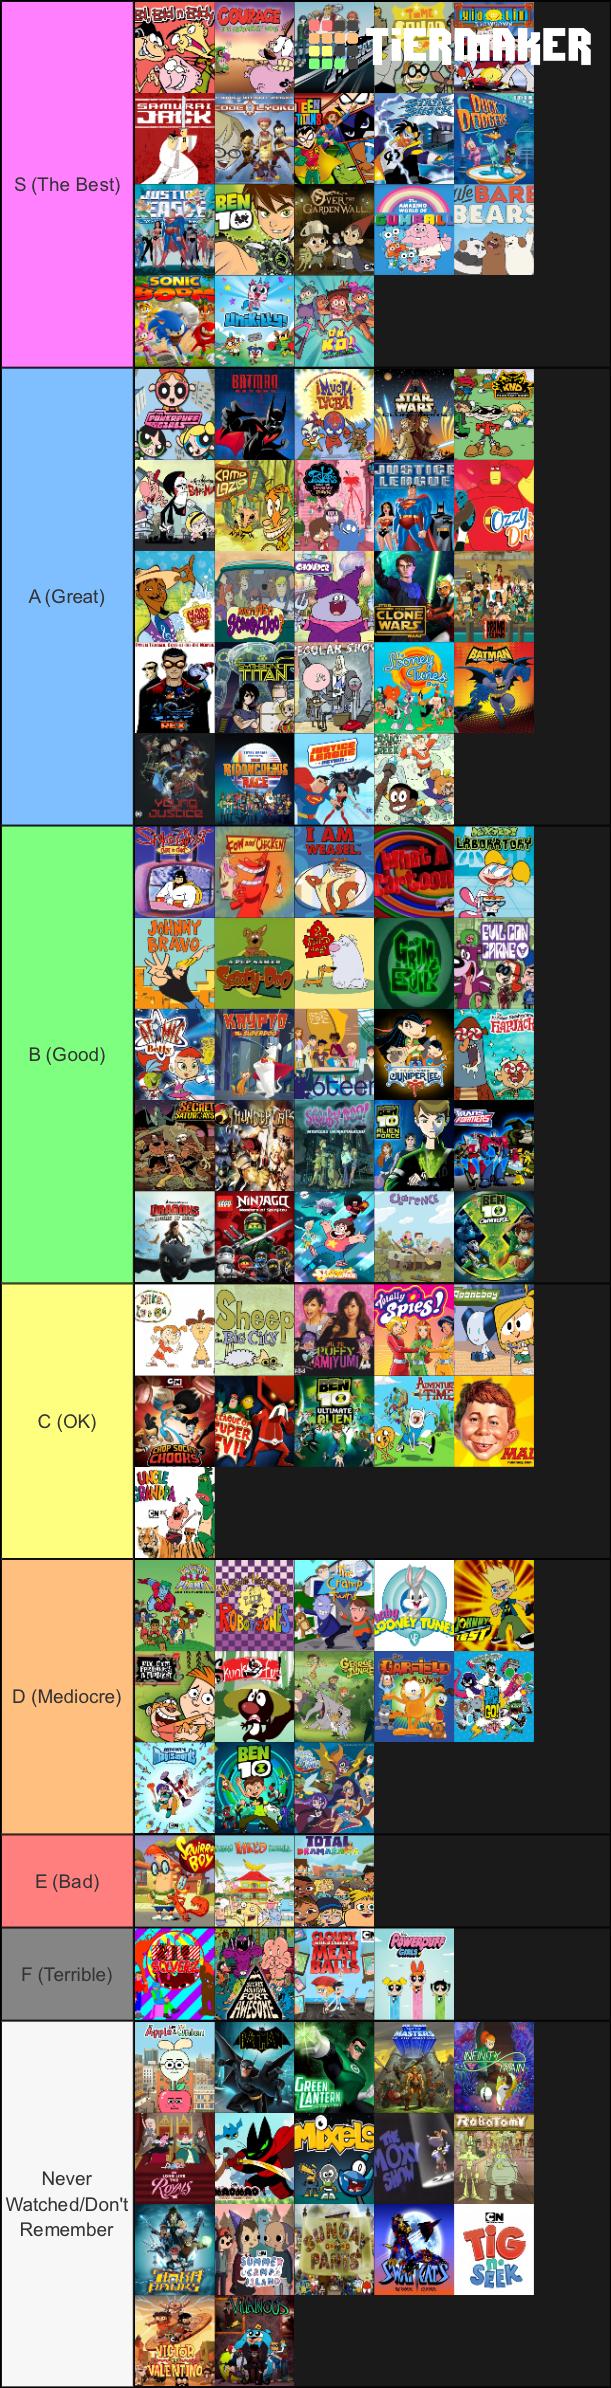 My Cartoon Network Shows Tier List By Firemaster92 On Deviantart